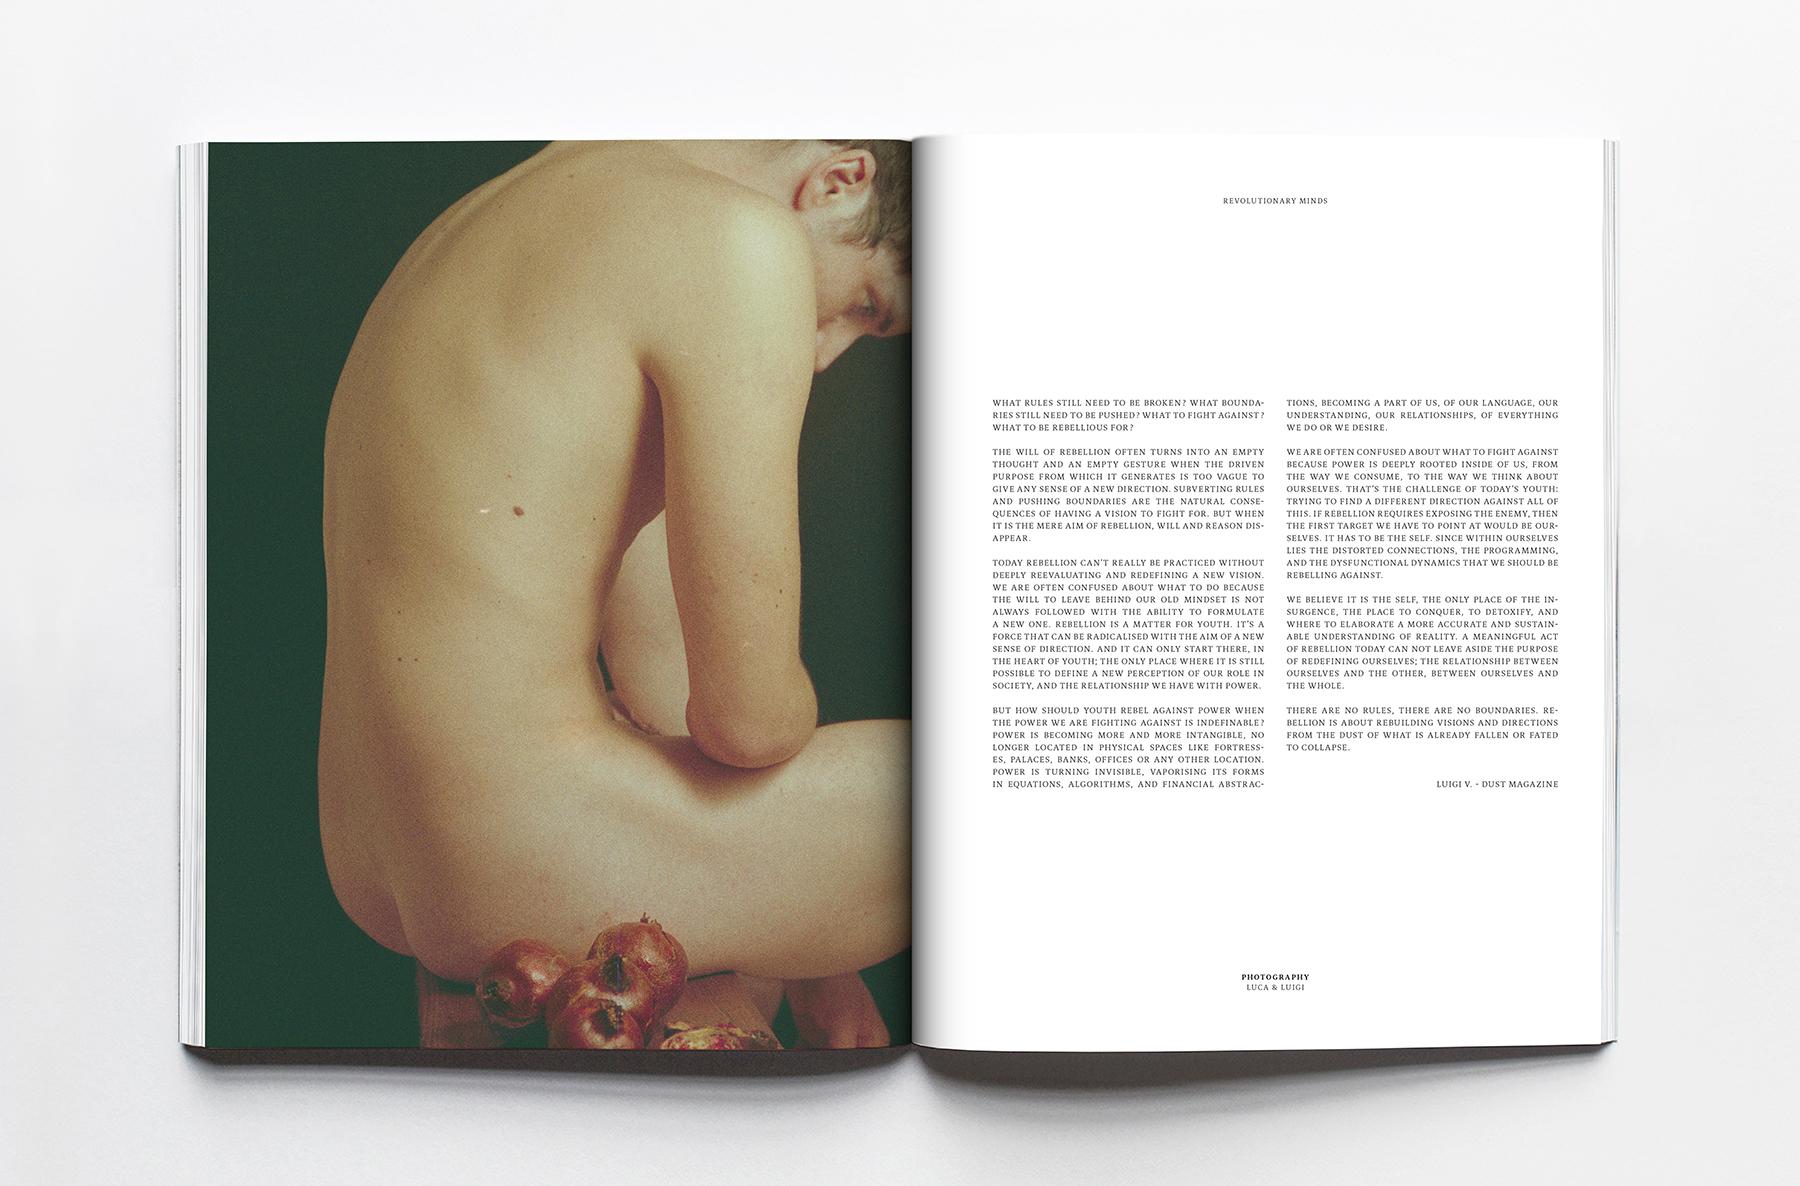 wla_magazine_24.jpg